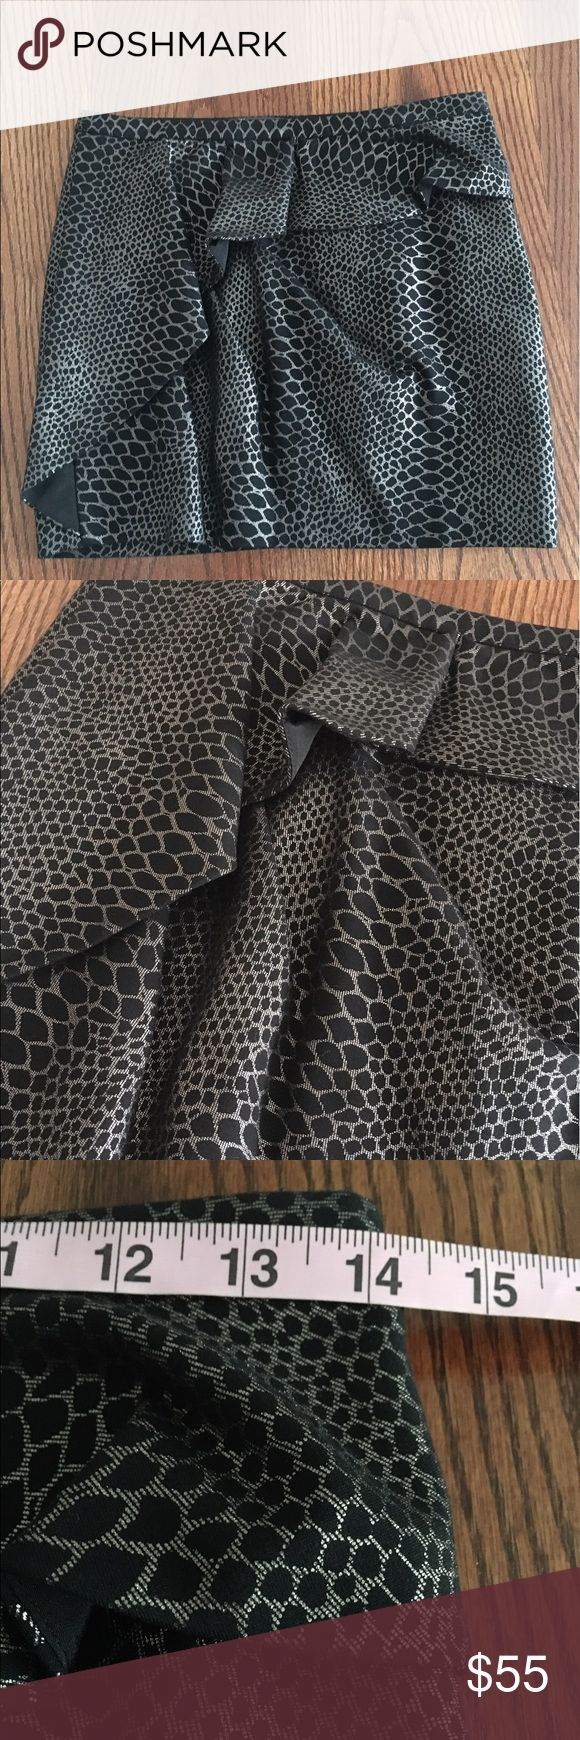 "Armani Exchange black and gray ruffled mini skirt Samantha says... • brand: Armani Exchange  • size: 0 • black and gray ruffled mini skirt  • snake skin look to it  • perfect for a night out or date night   Measurements: • waist: 14"" across  • length: 14""  #ax #armani #armaniexchange #black #gray #grey #ruffles #miniskirt #skirt #mini #ruffled #size0 #sizezero #zero #sexy #datenight #samtalee613 A/X Armani Exchange Skirts Mini"